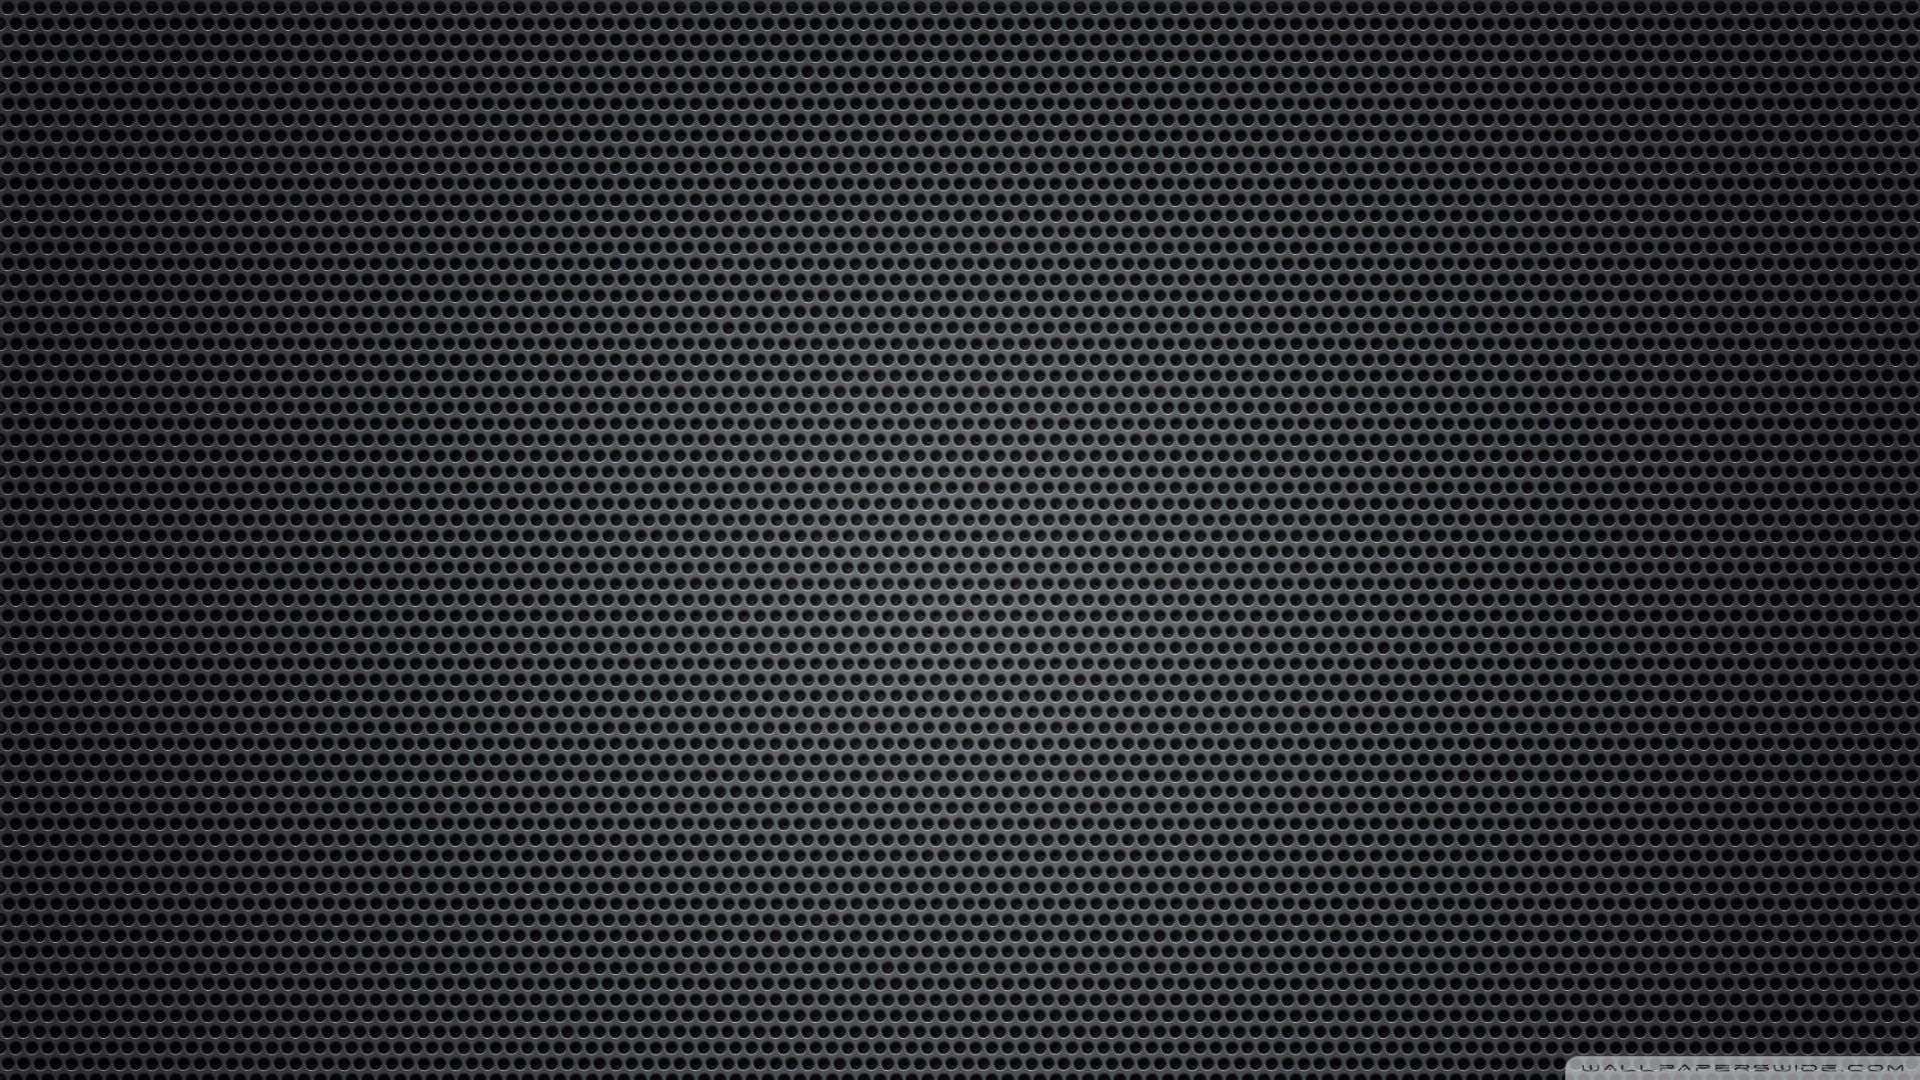 Metallic Background ·① Download Free Stunning Wallpapers